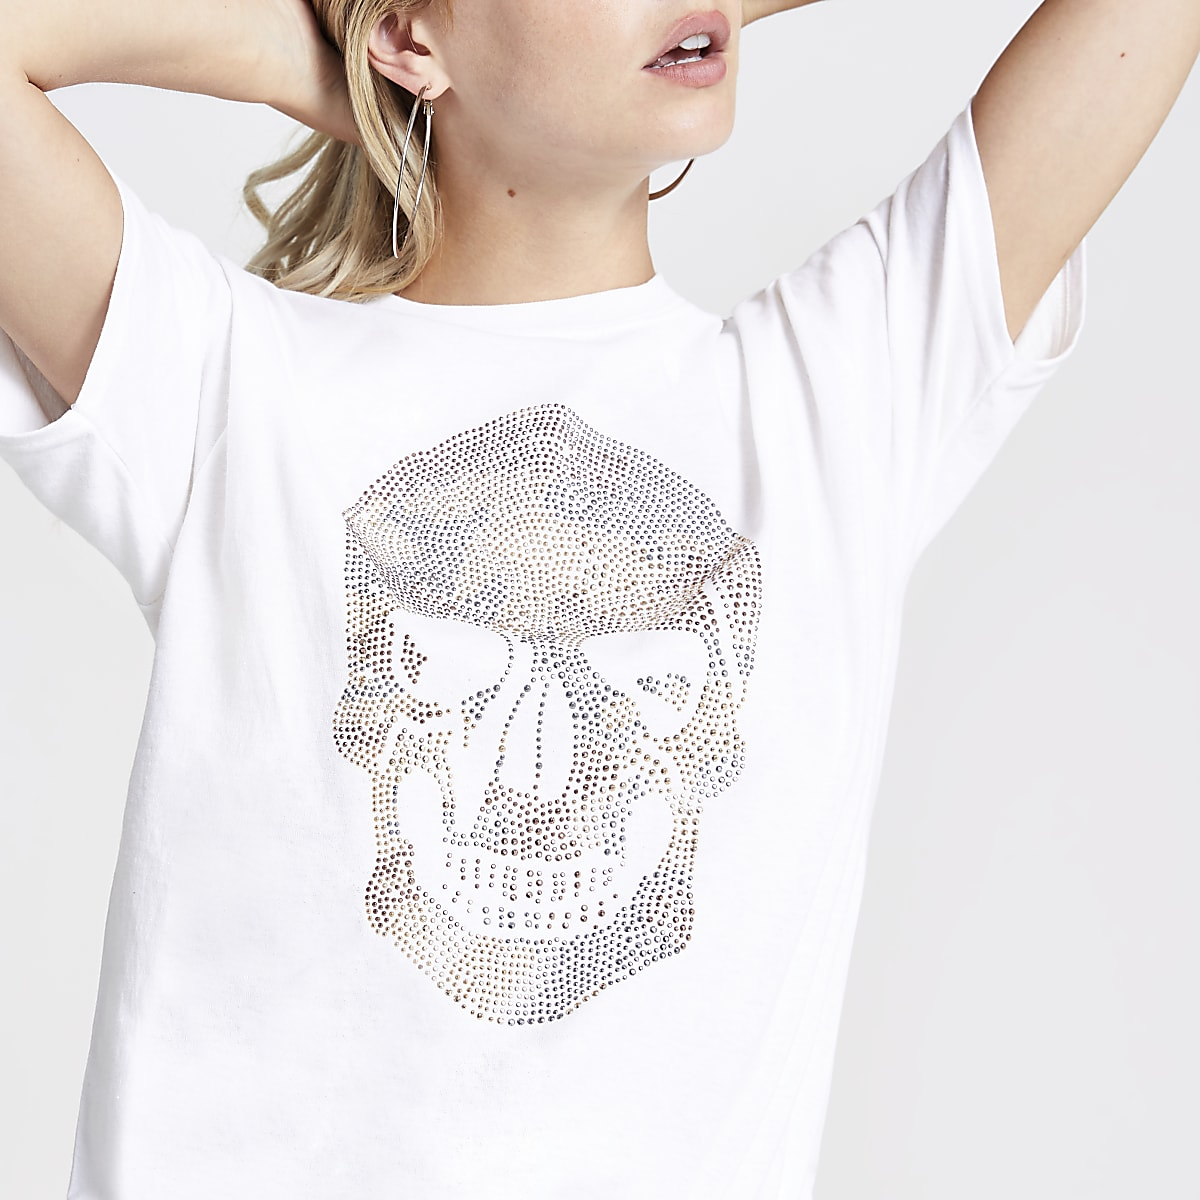 RI Petite - Wit T-shirt met doodskopprint